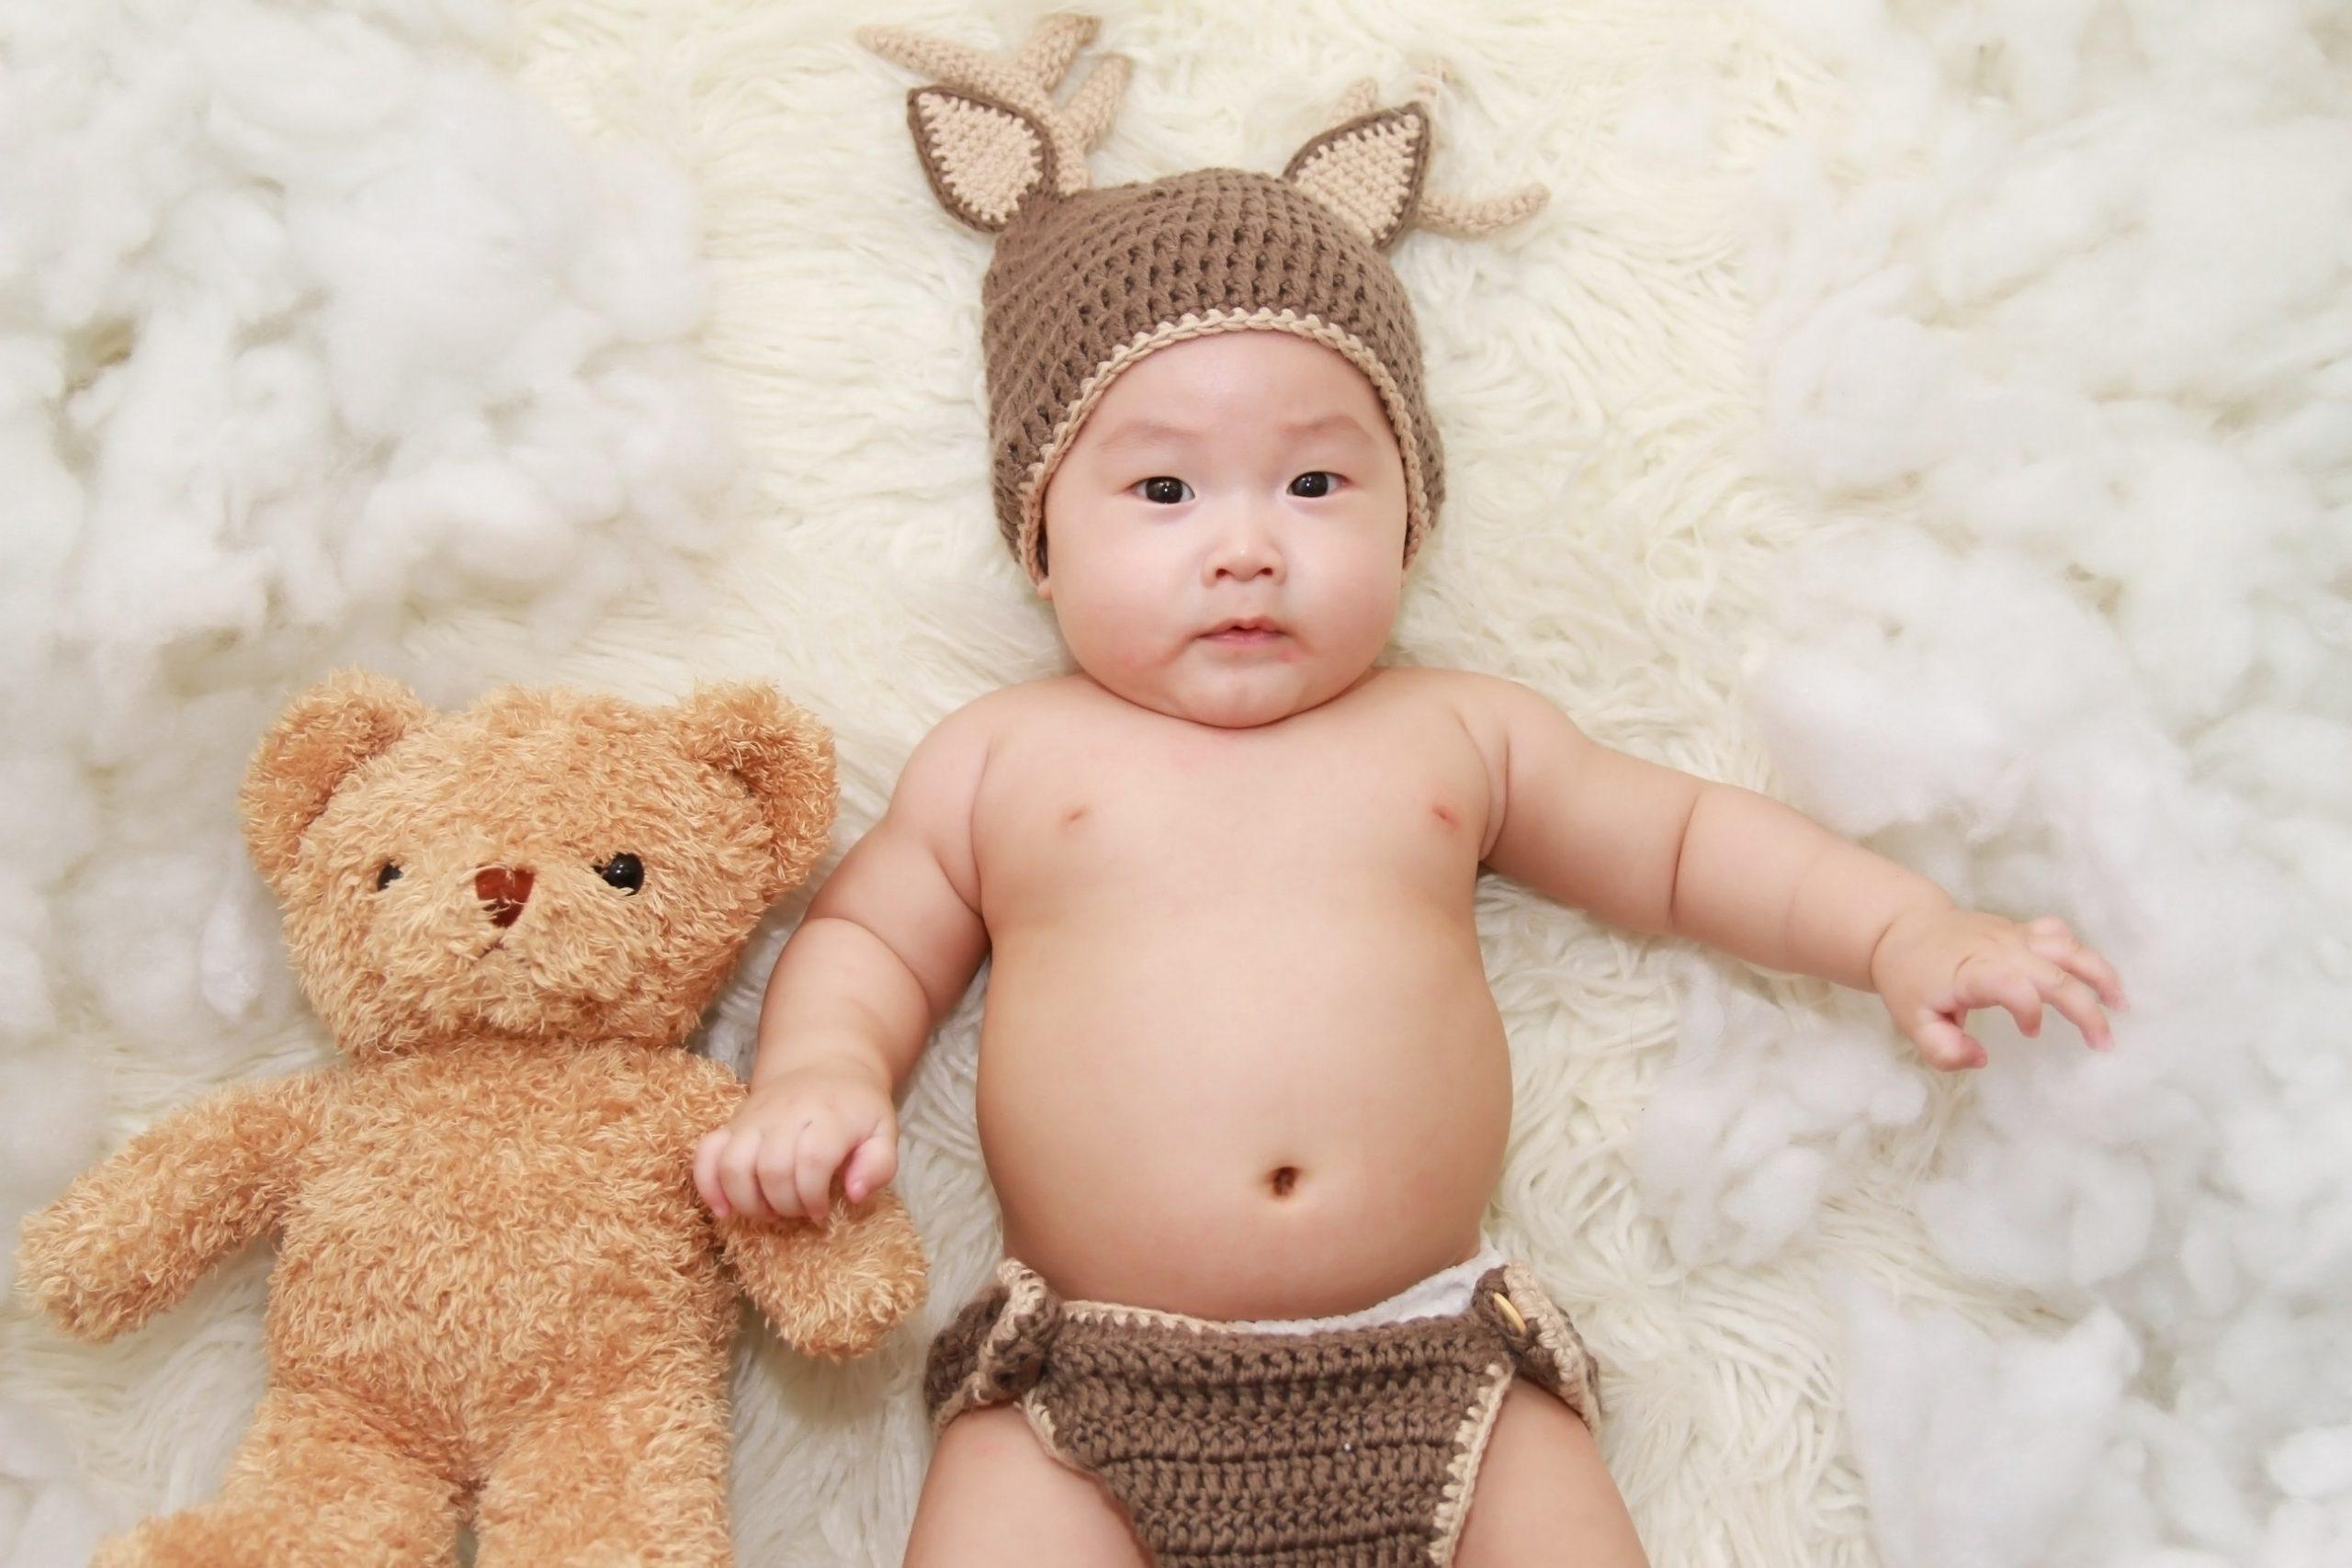 adorable-baby-beanie-bonnet-421879